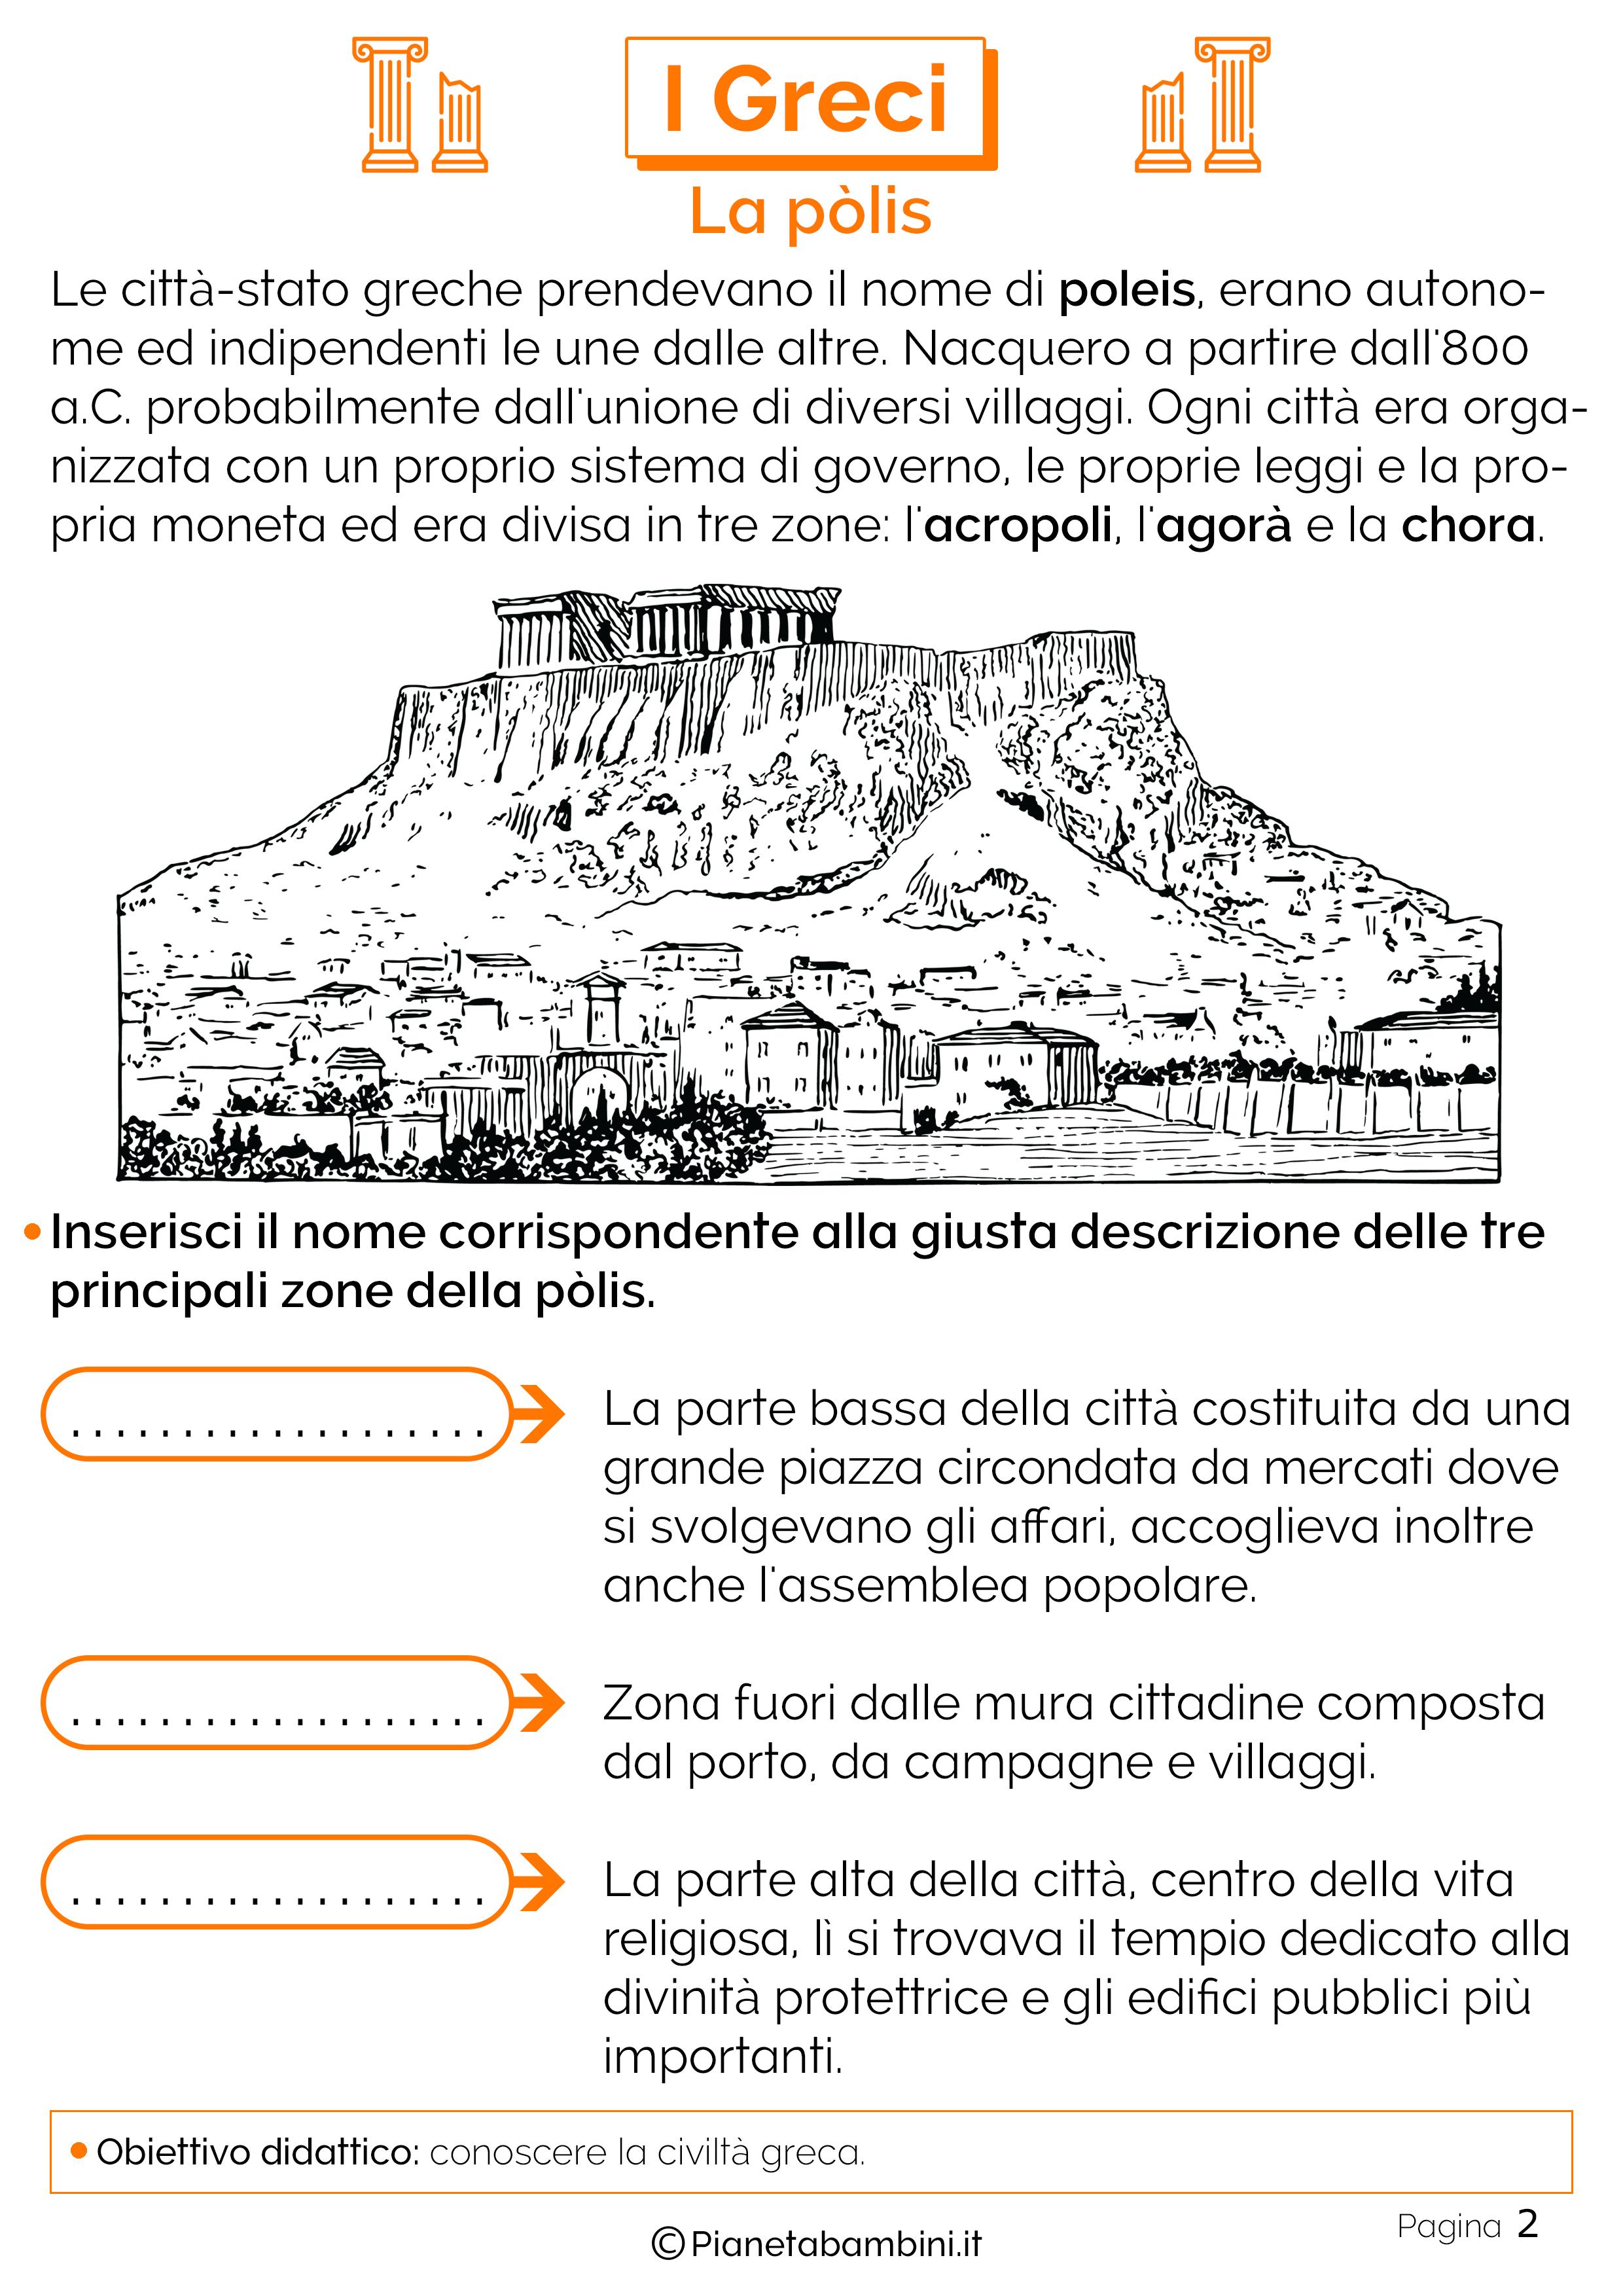 La pòlis greca